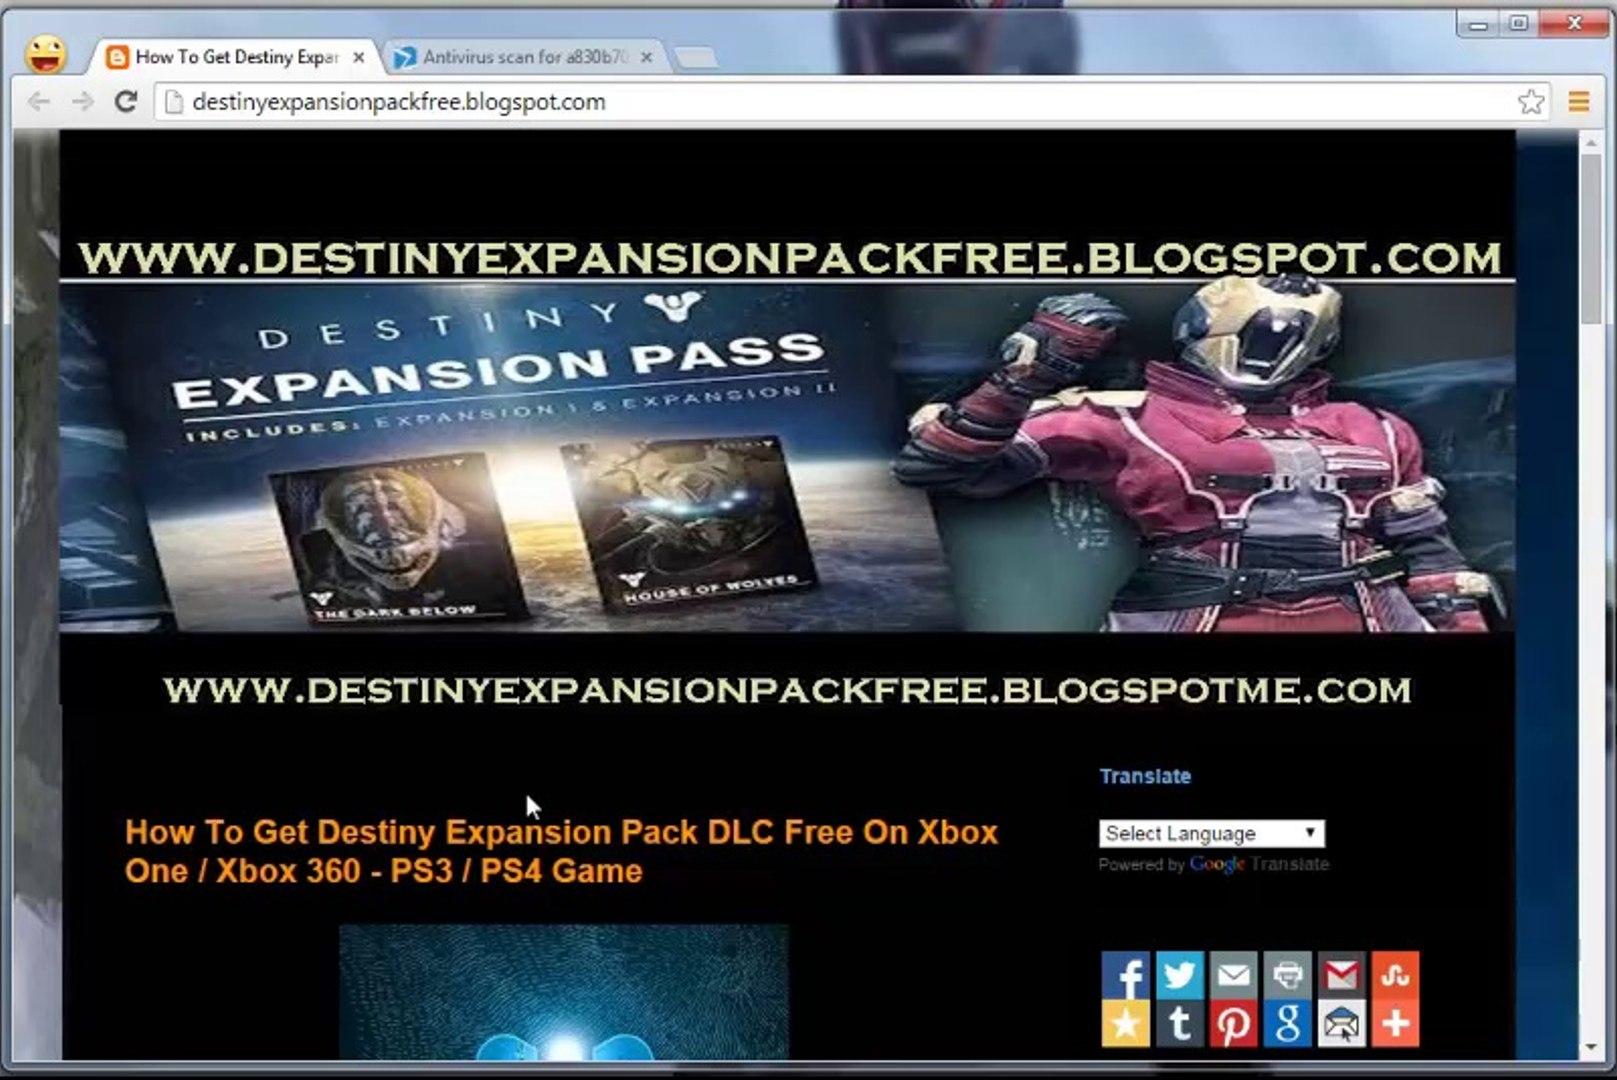 Unlock/ Install Destiny Expansion Pack DLC Code Leaked